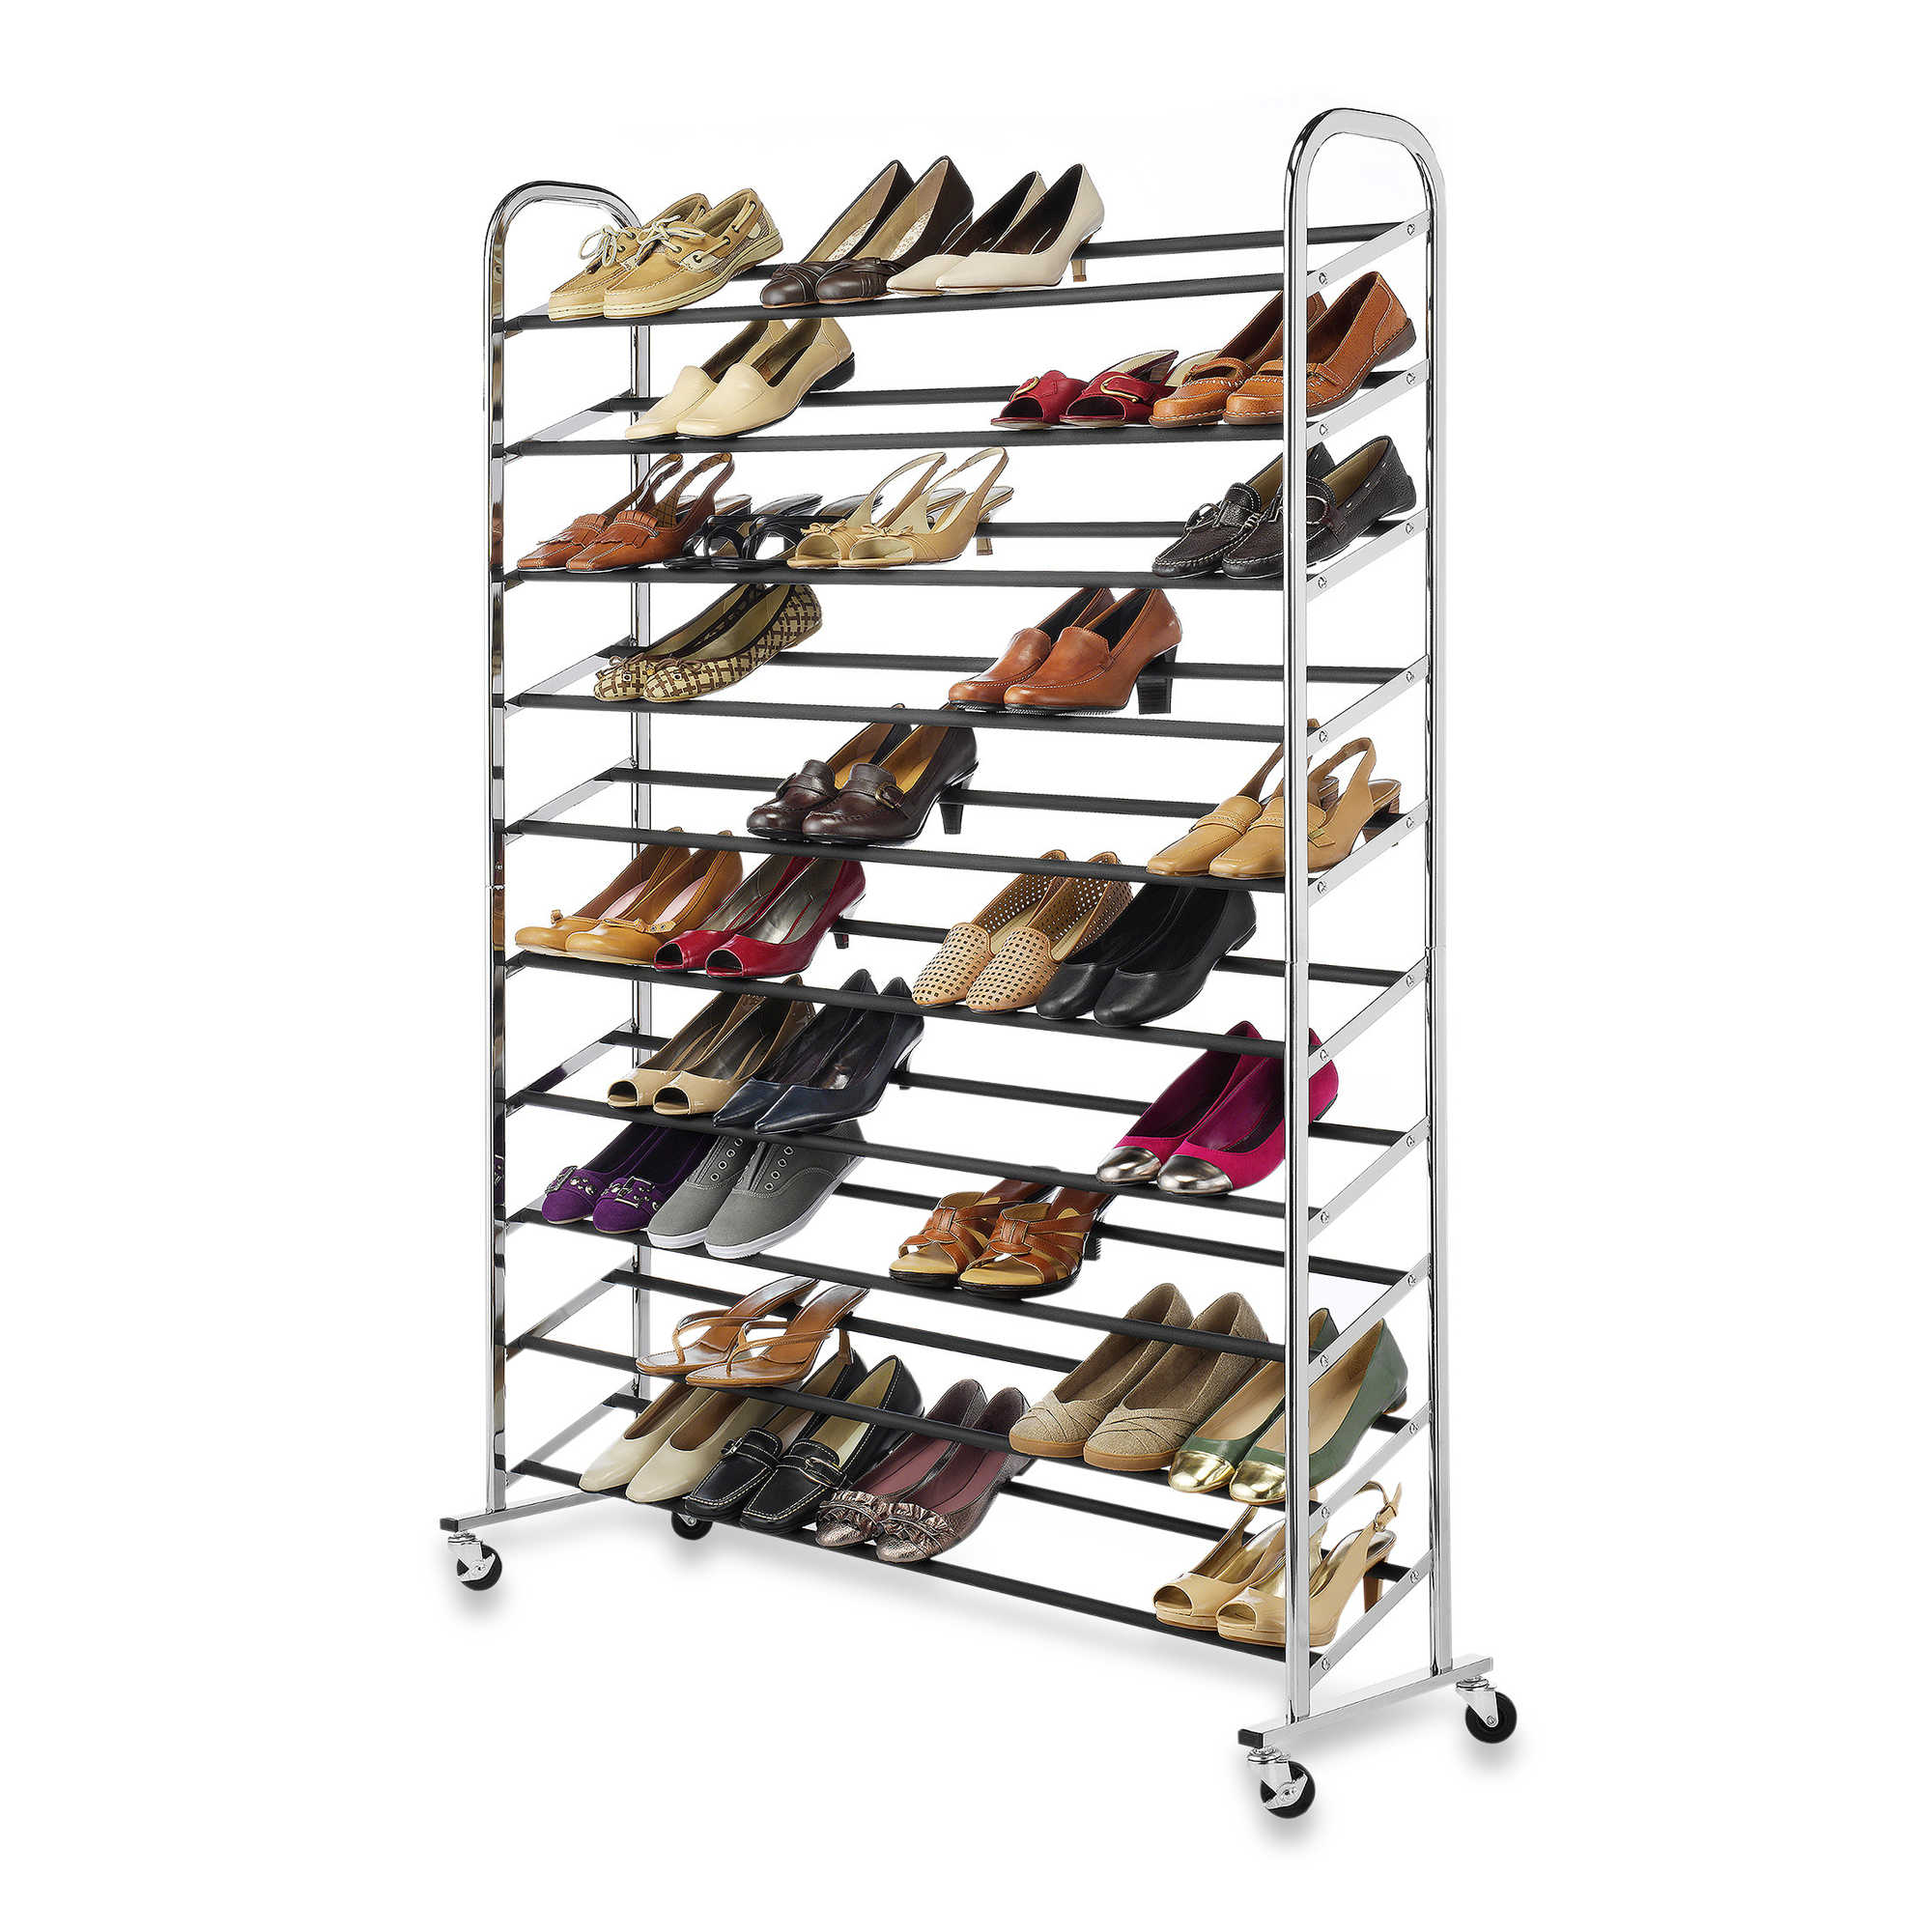 Shoe Rack 60 Pair Rolling Shoe Rack In Chrome Bed Bath Beyond